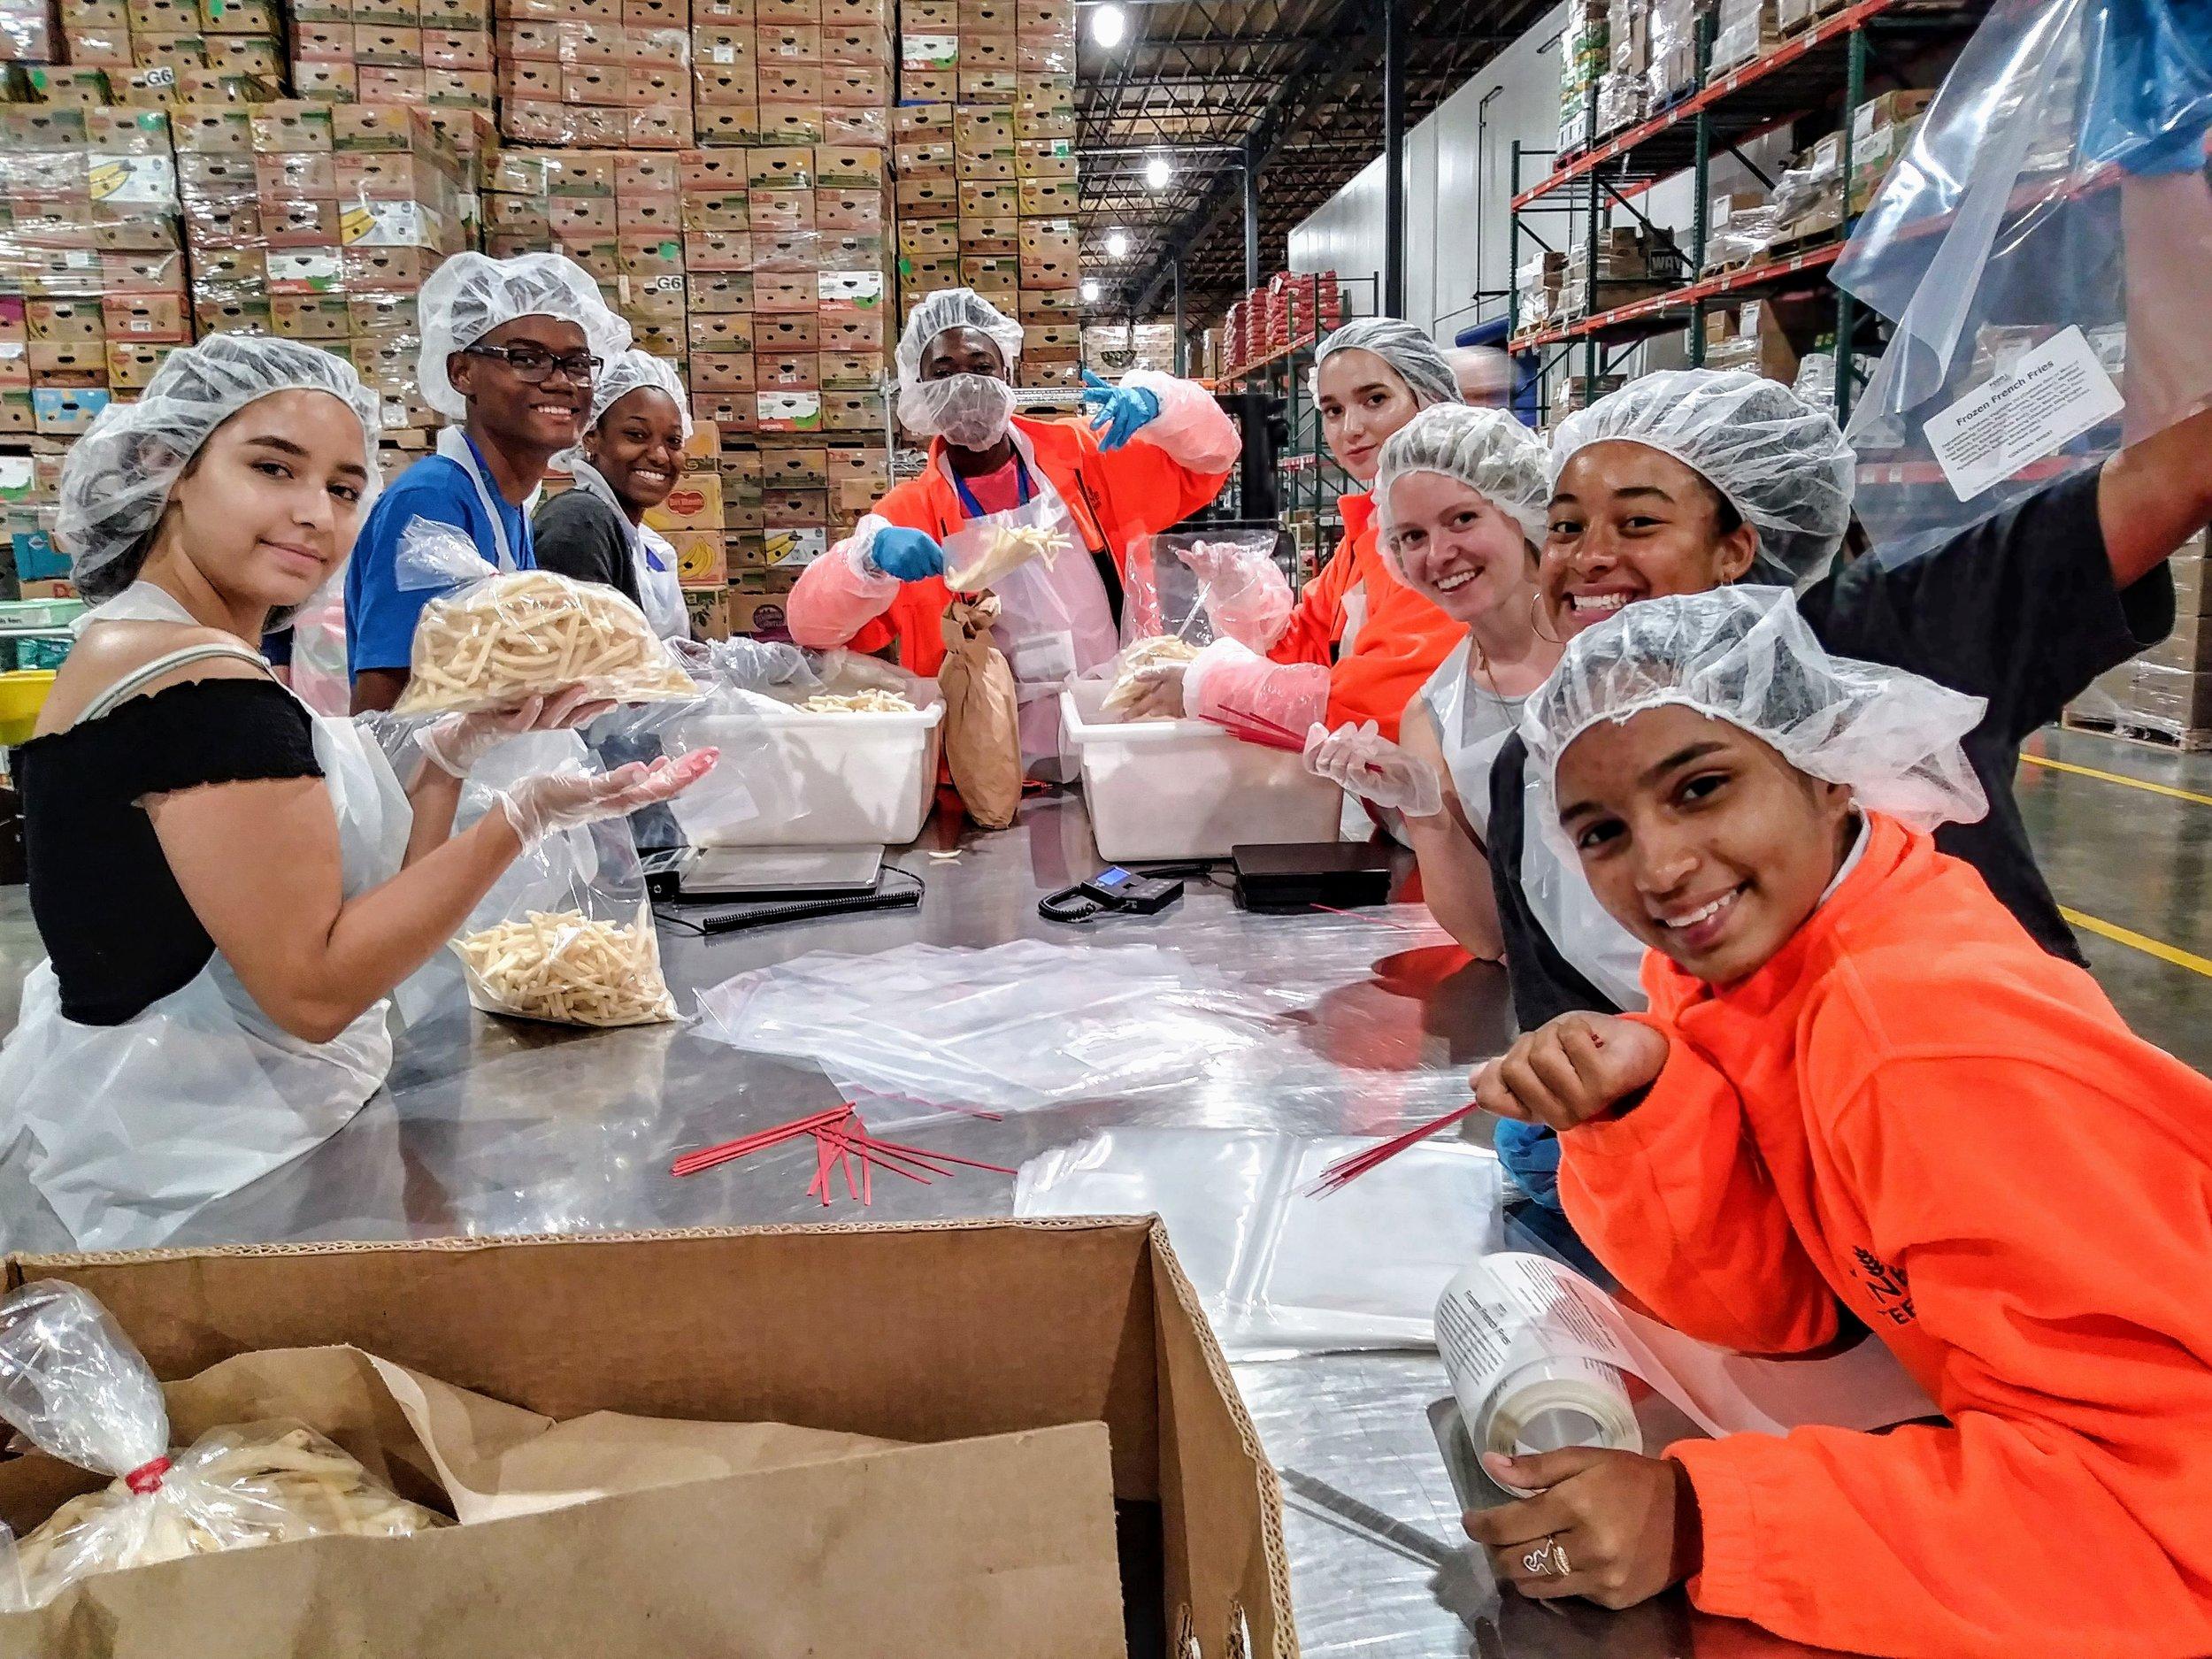 Caribbean 2018 Young Ambassadors and Local Young Ambassadors volunteering at Food Lifeline